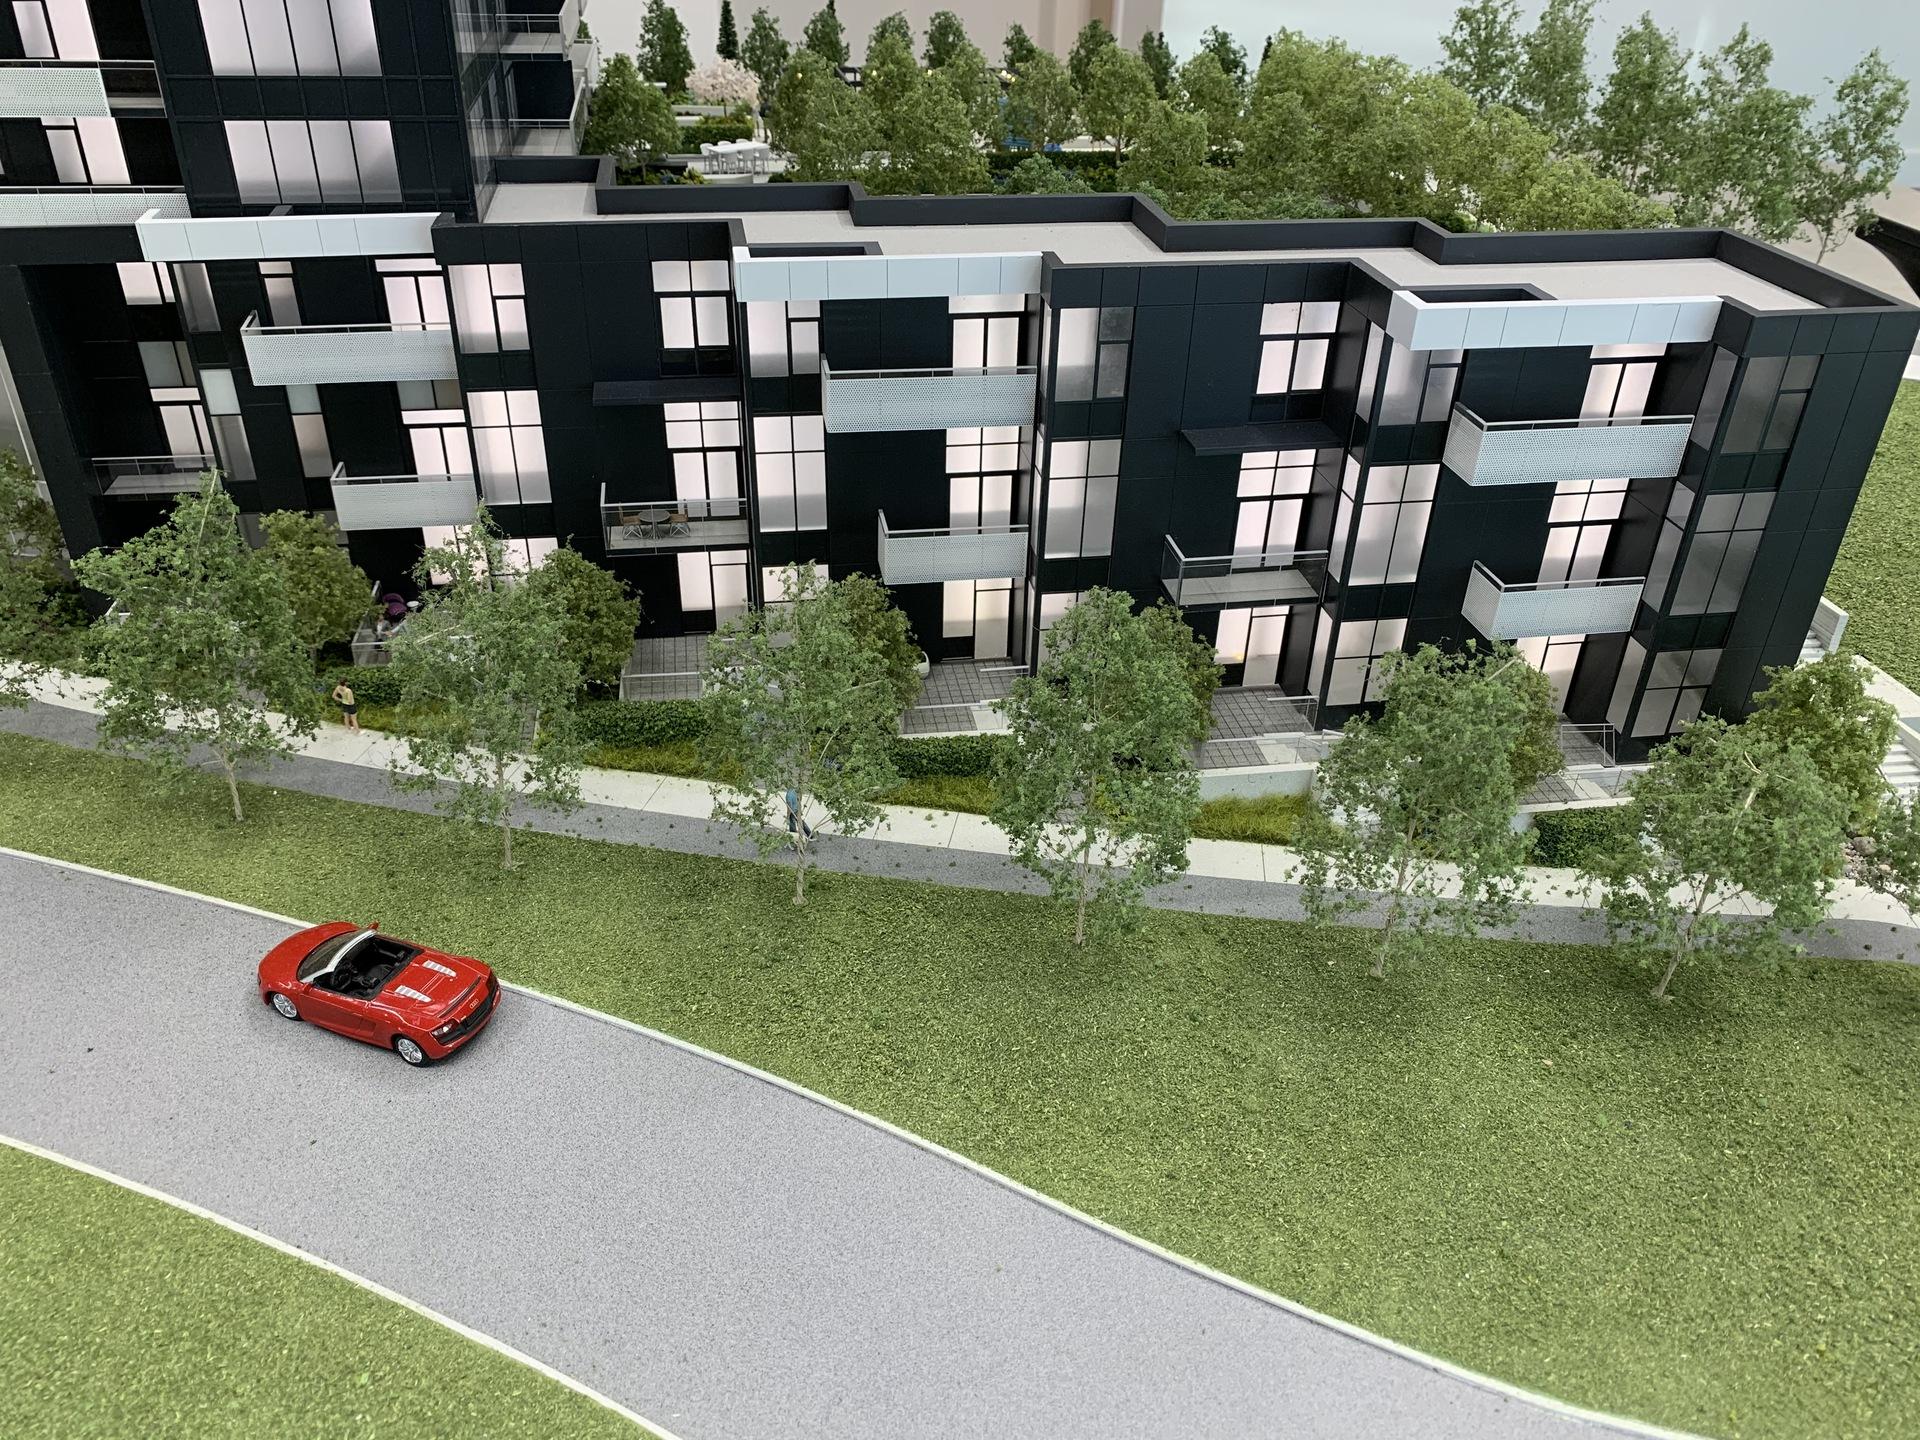 alaska-south-facing-2-level-1-bedroom-lofts-with-2-3-bed-units-on-top-floor at Alaska (4455 Alaska Street, Brentwood Park, Burnaby North)